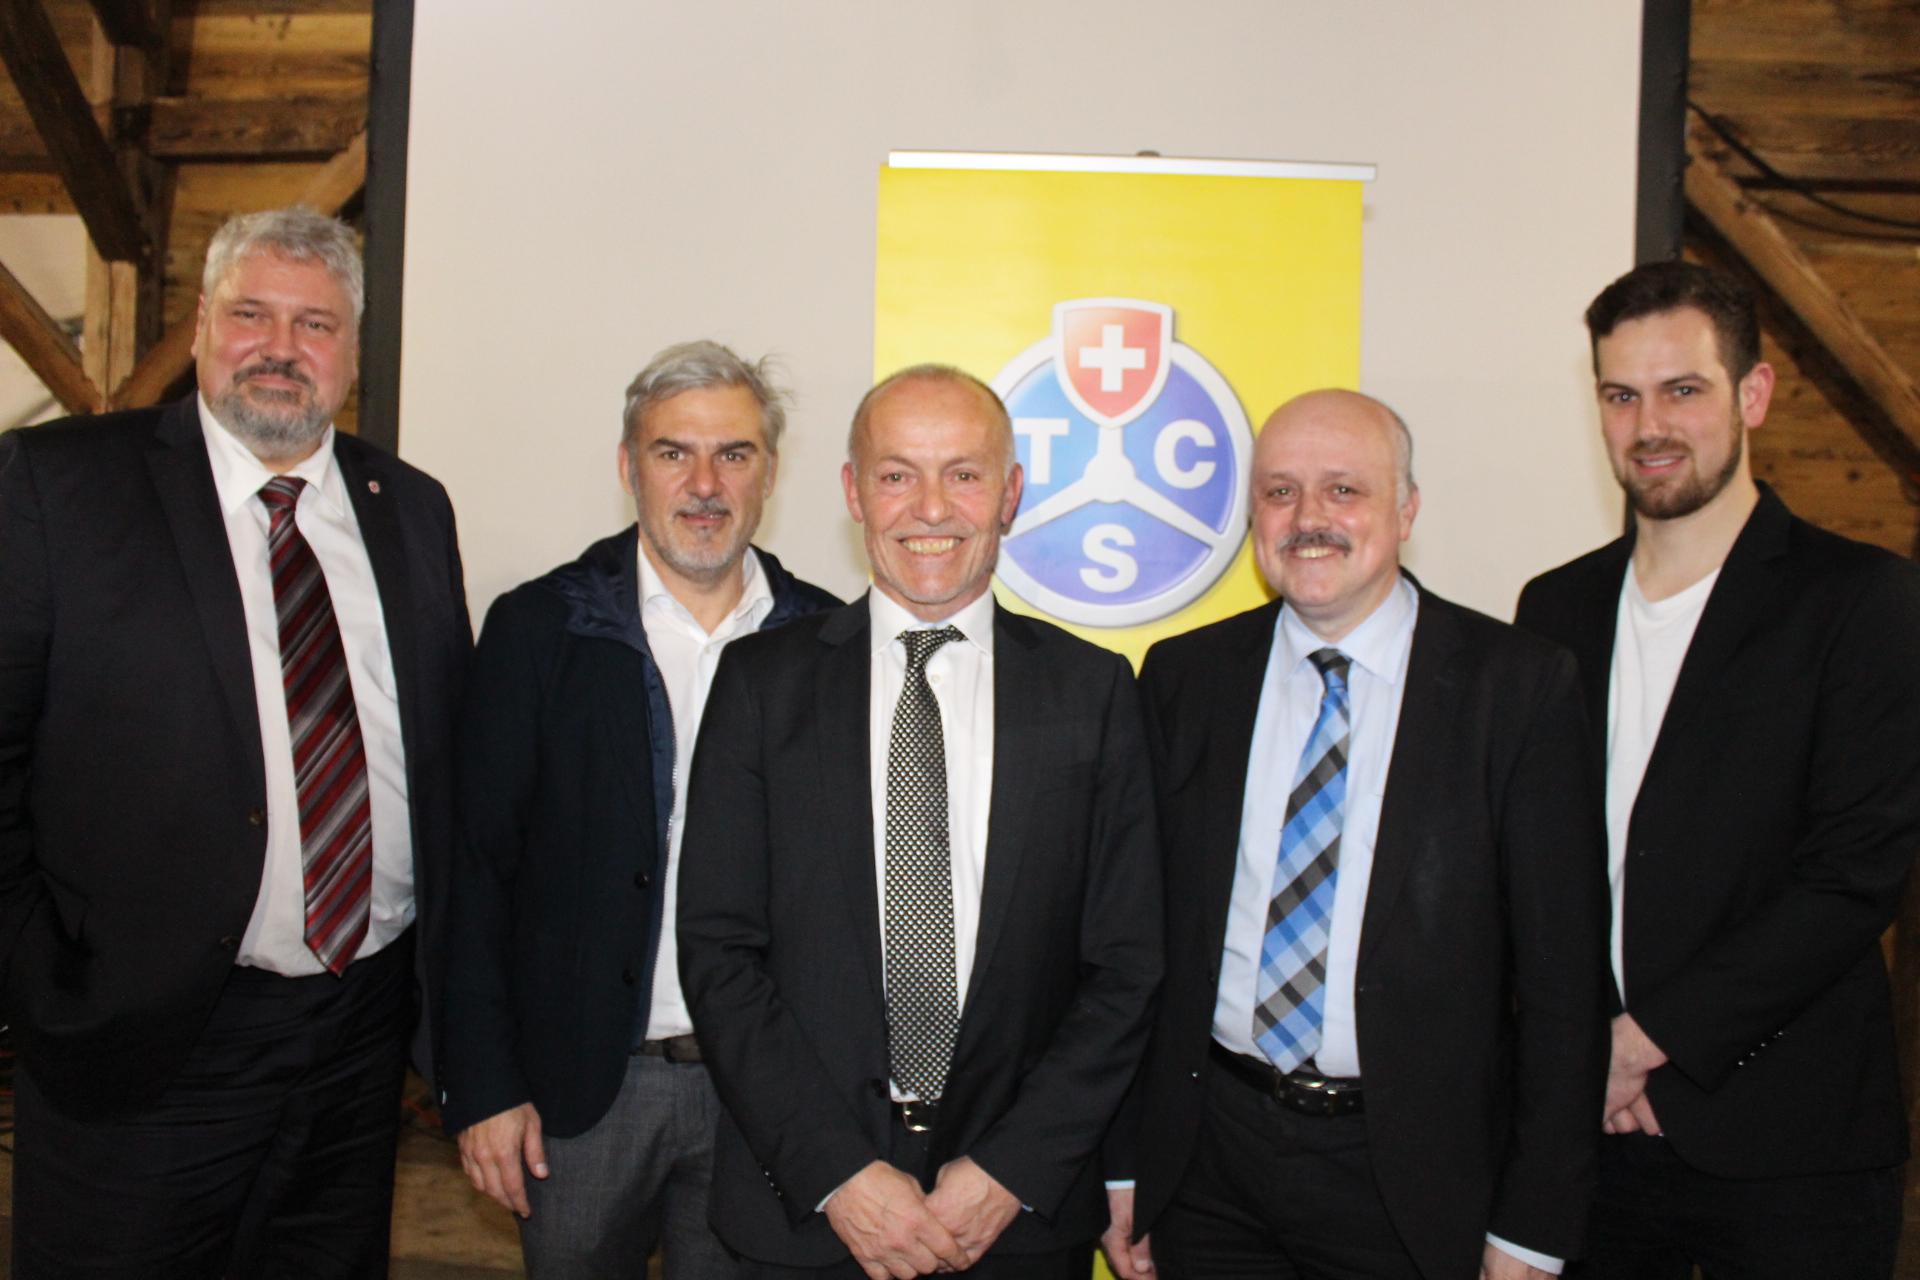 TCS Ortsgruppe Winterthur: Attraktives Jahresprogramm